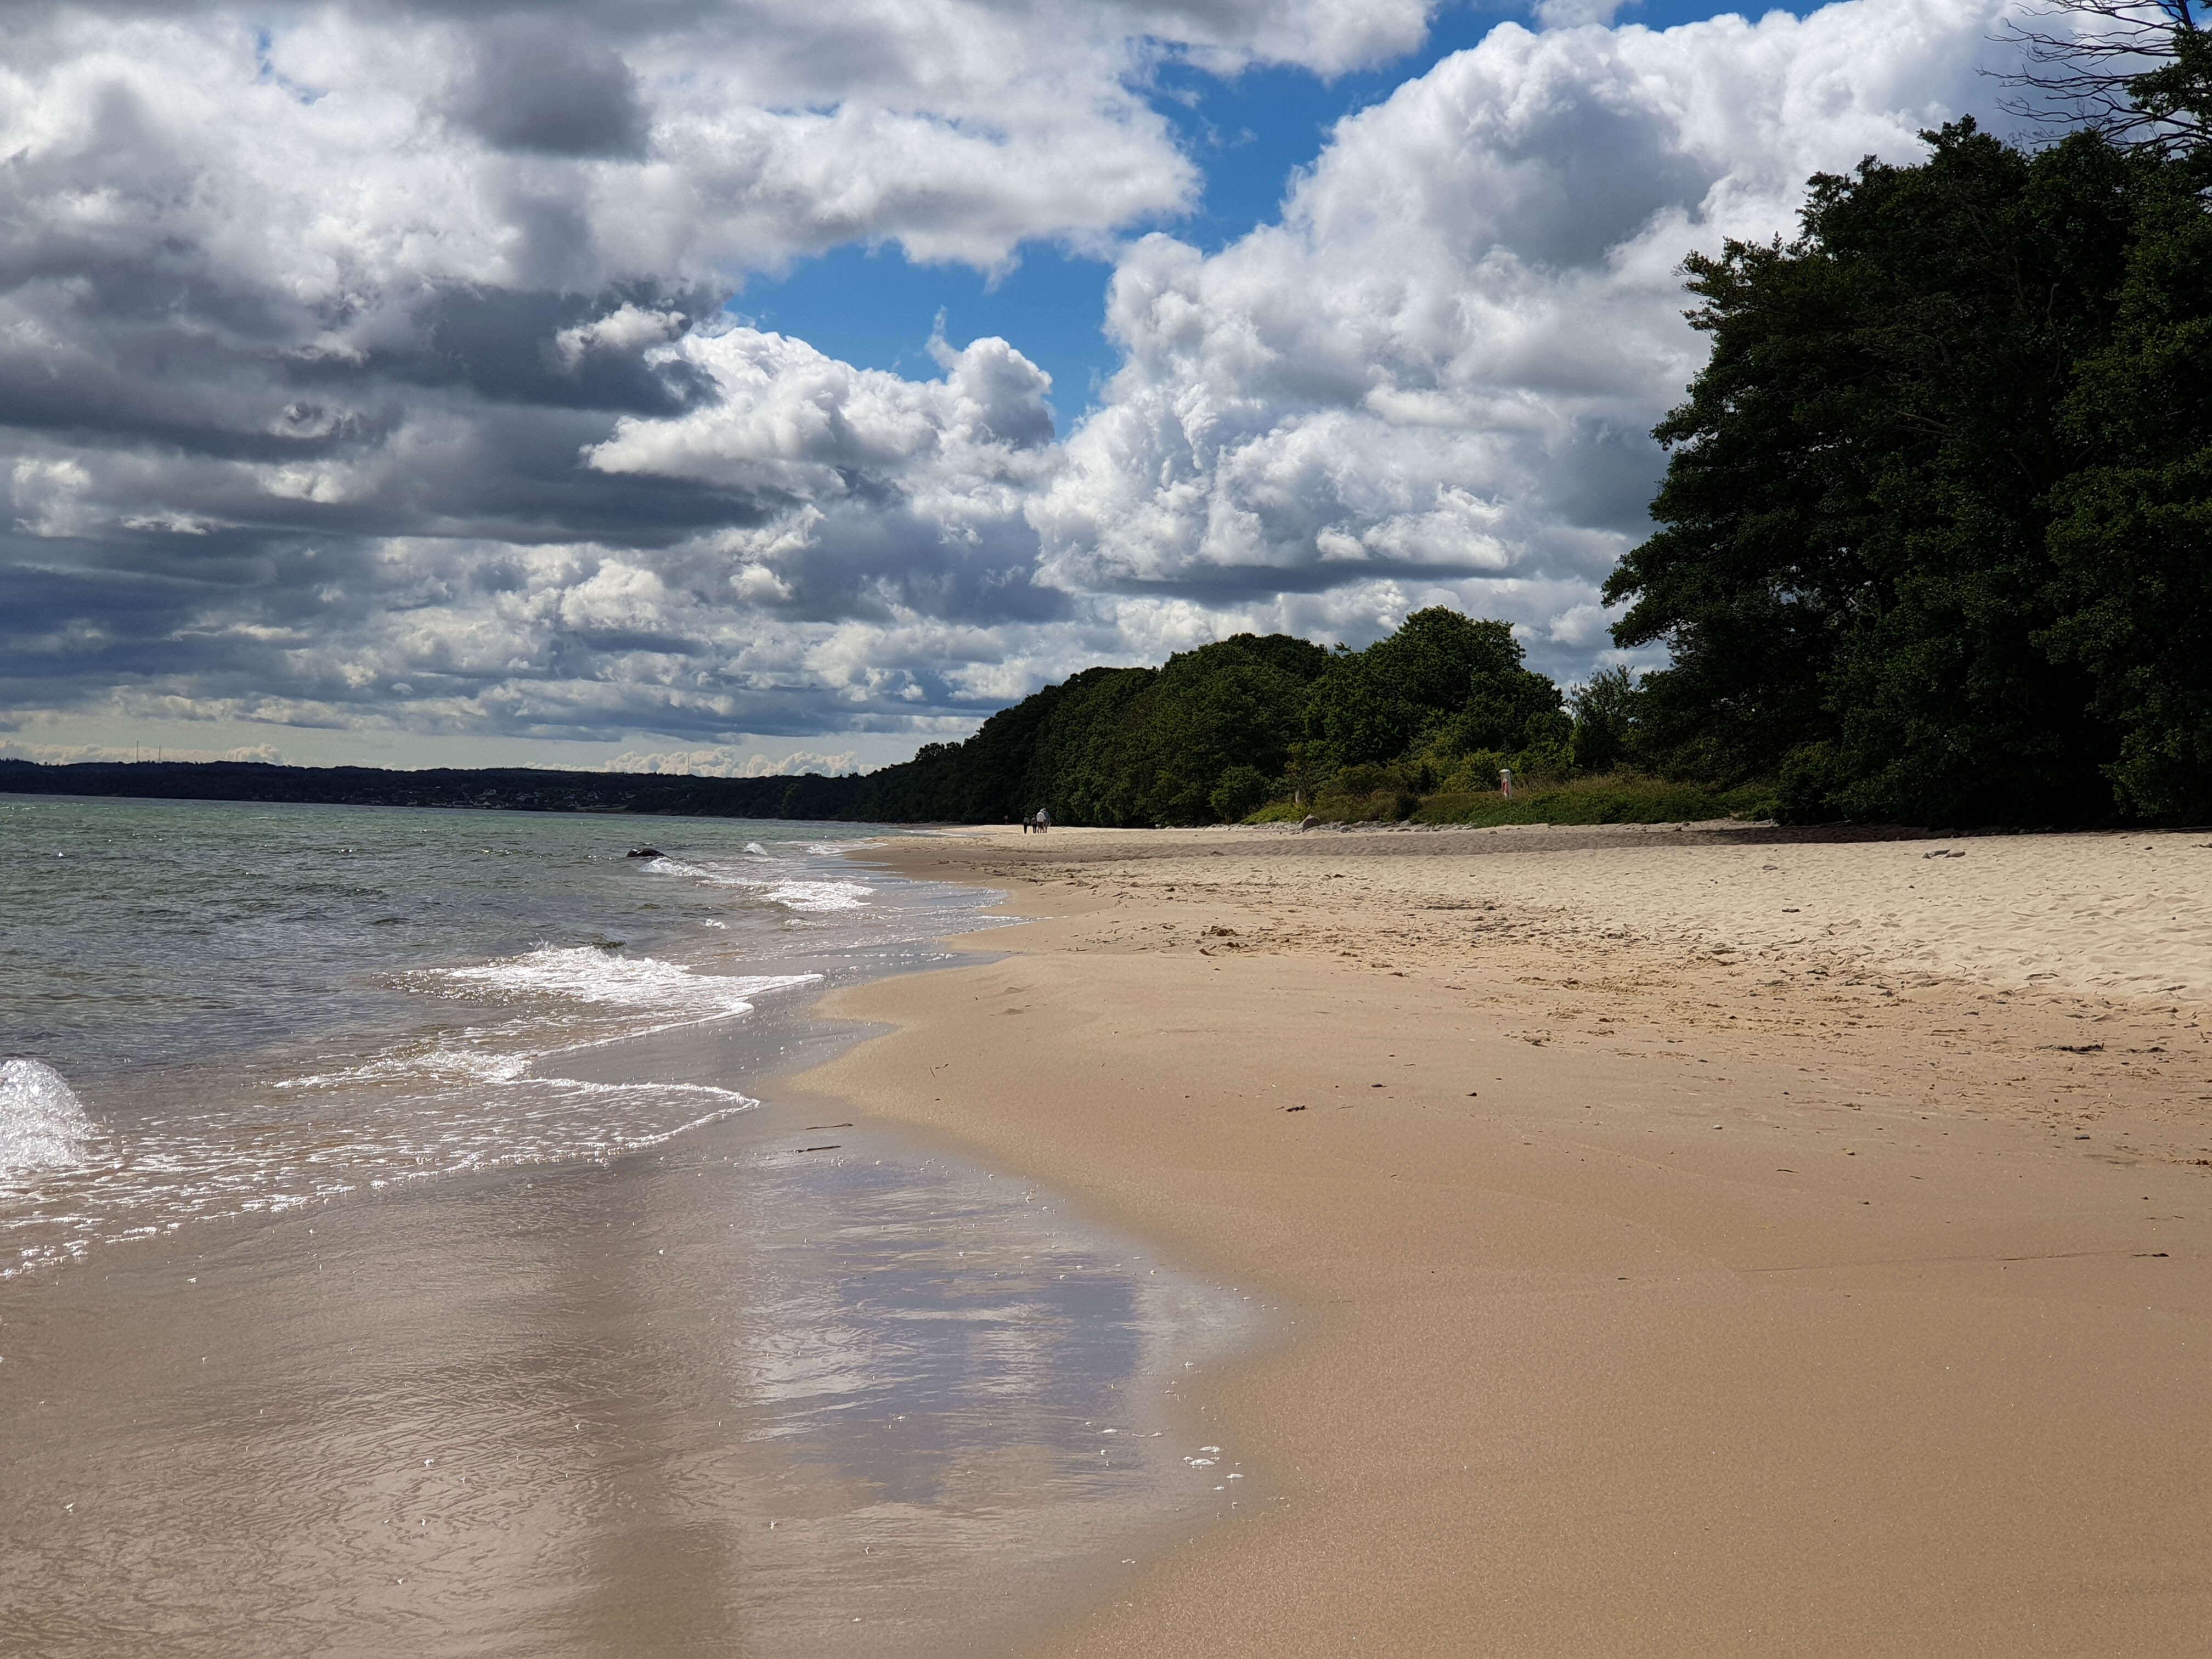 Stranden in Stenshuvud National Park